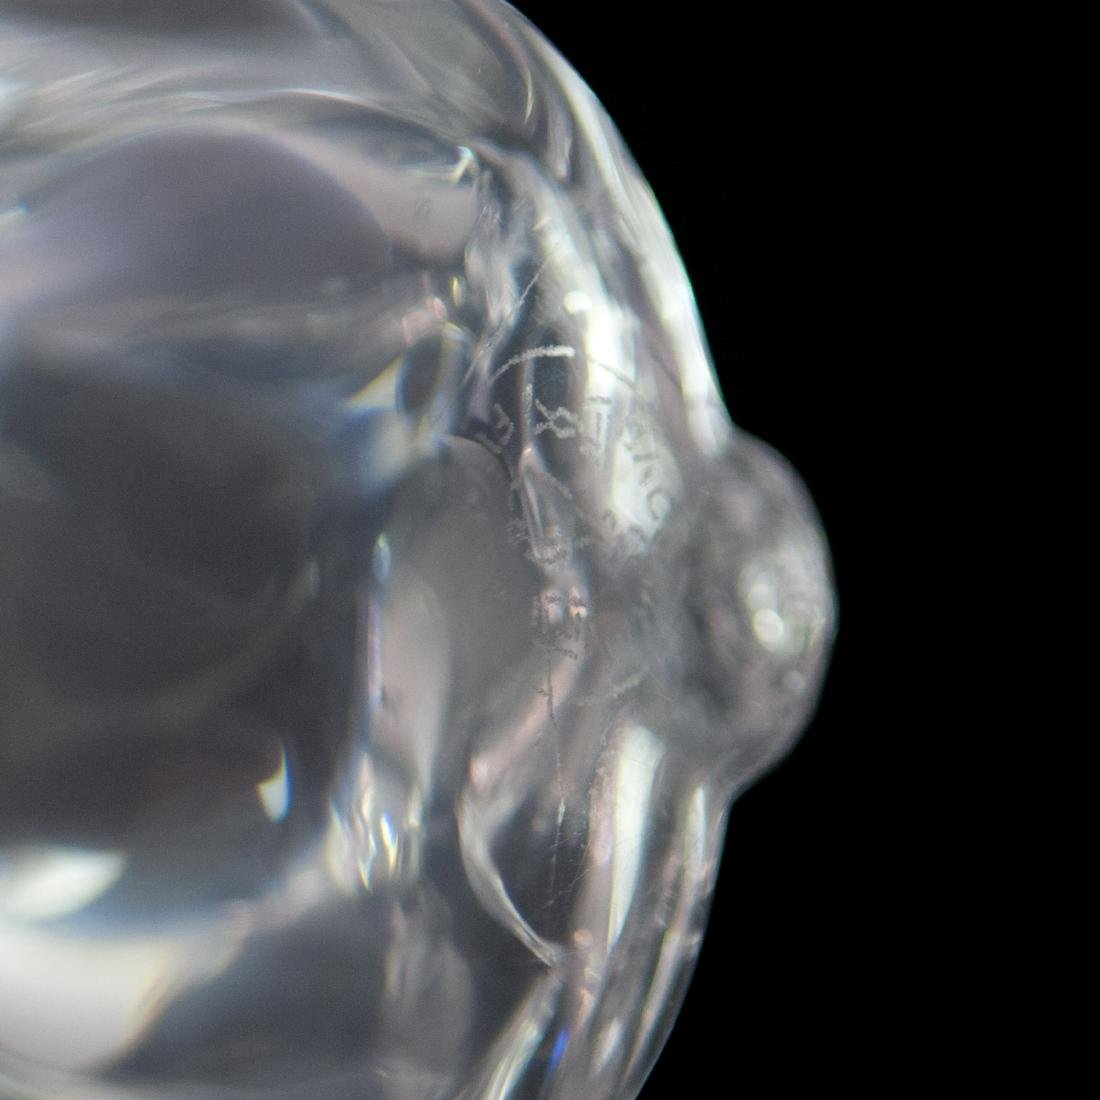 Baccarat Crystal Animal Figurines - 2